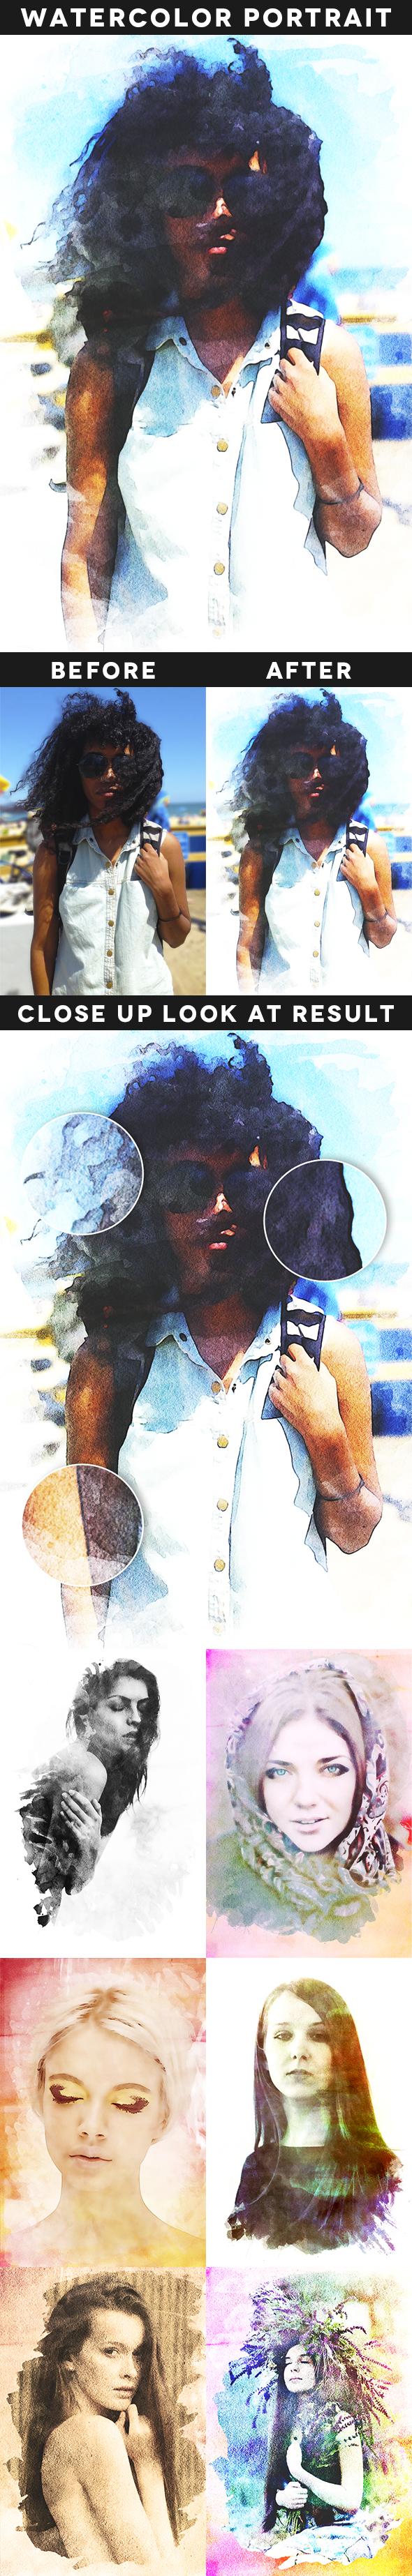 Watercolor Portrait Action - Photo Effects Actions